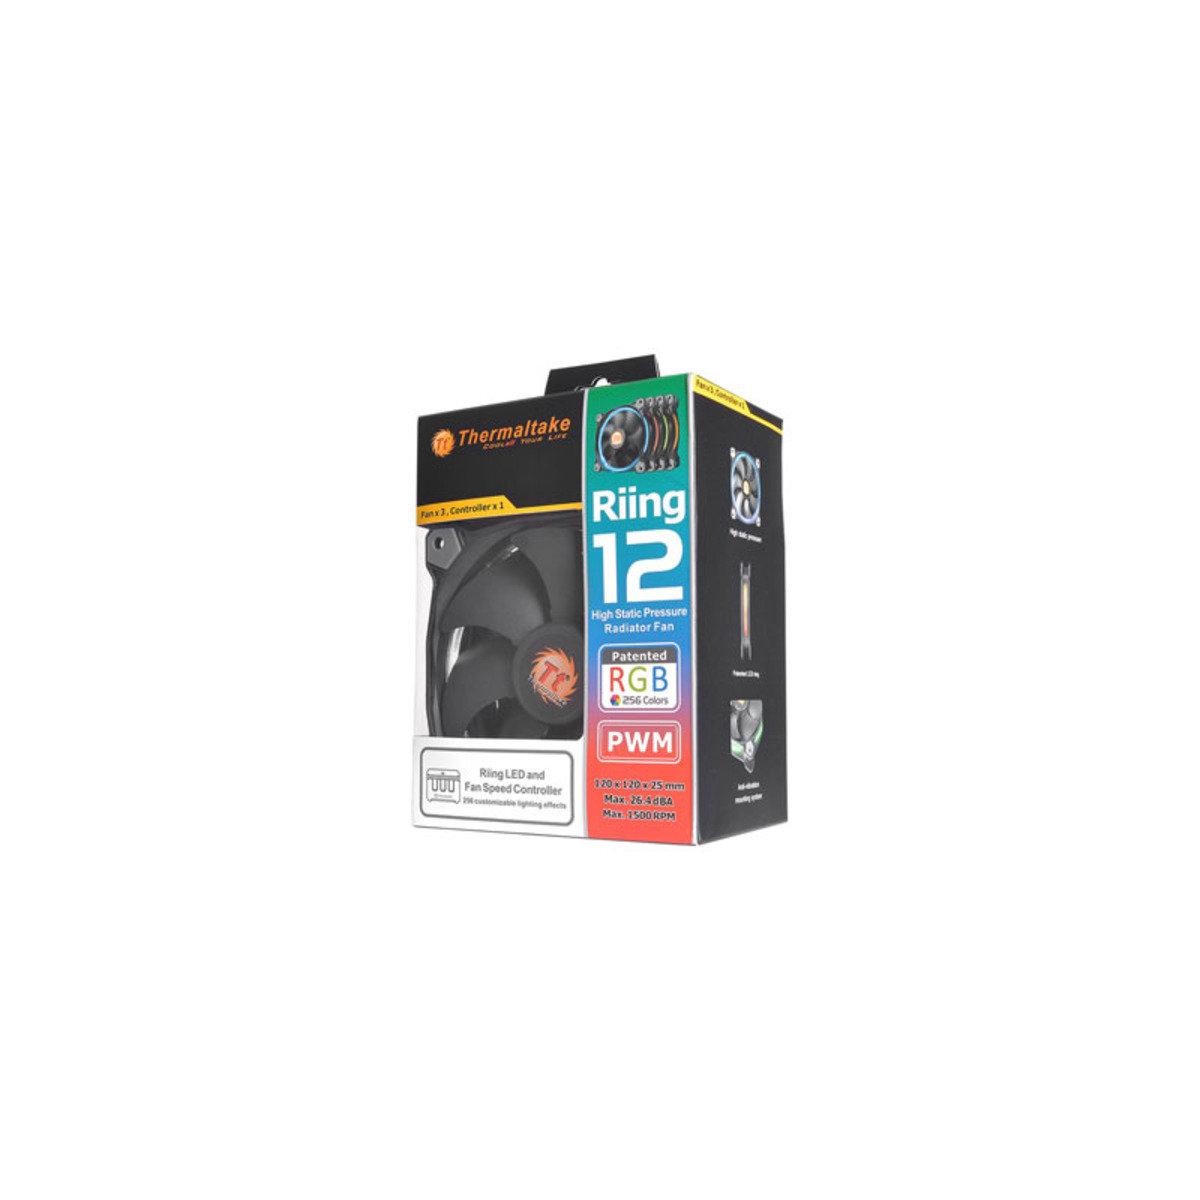 14cm高風壓RGB 256色LED機箱風扇 (三件優惠裝) Riing 14 RGB